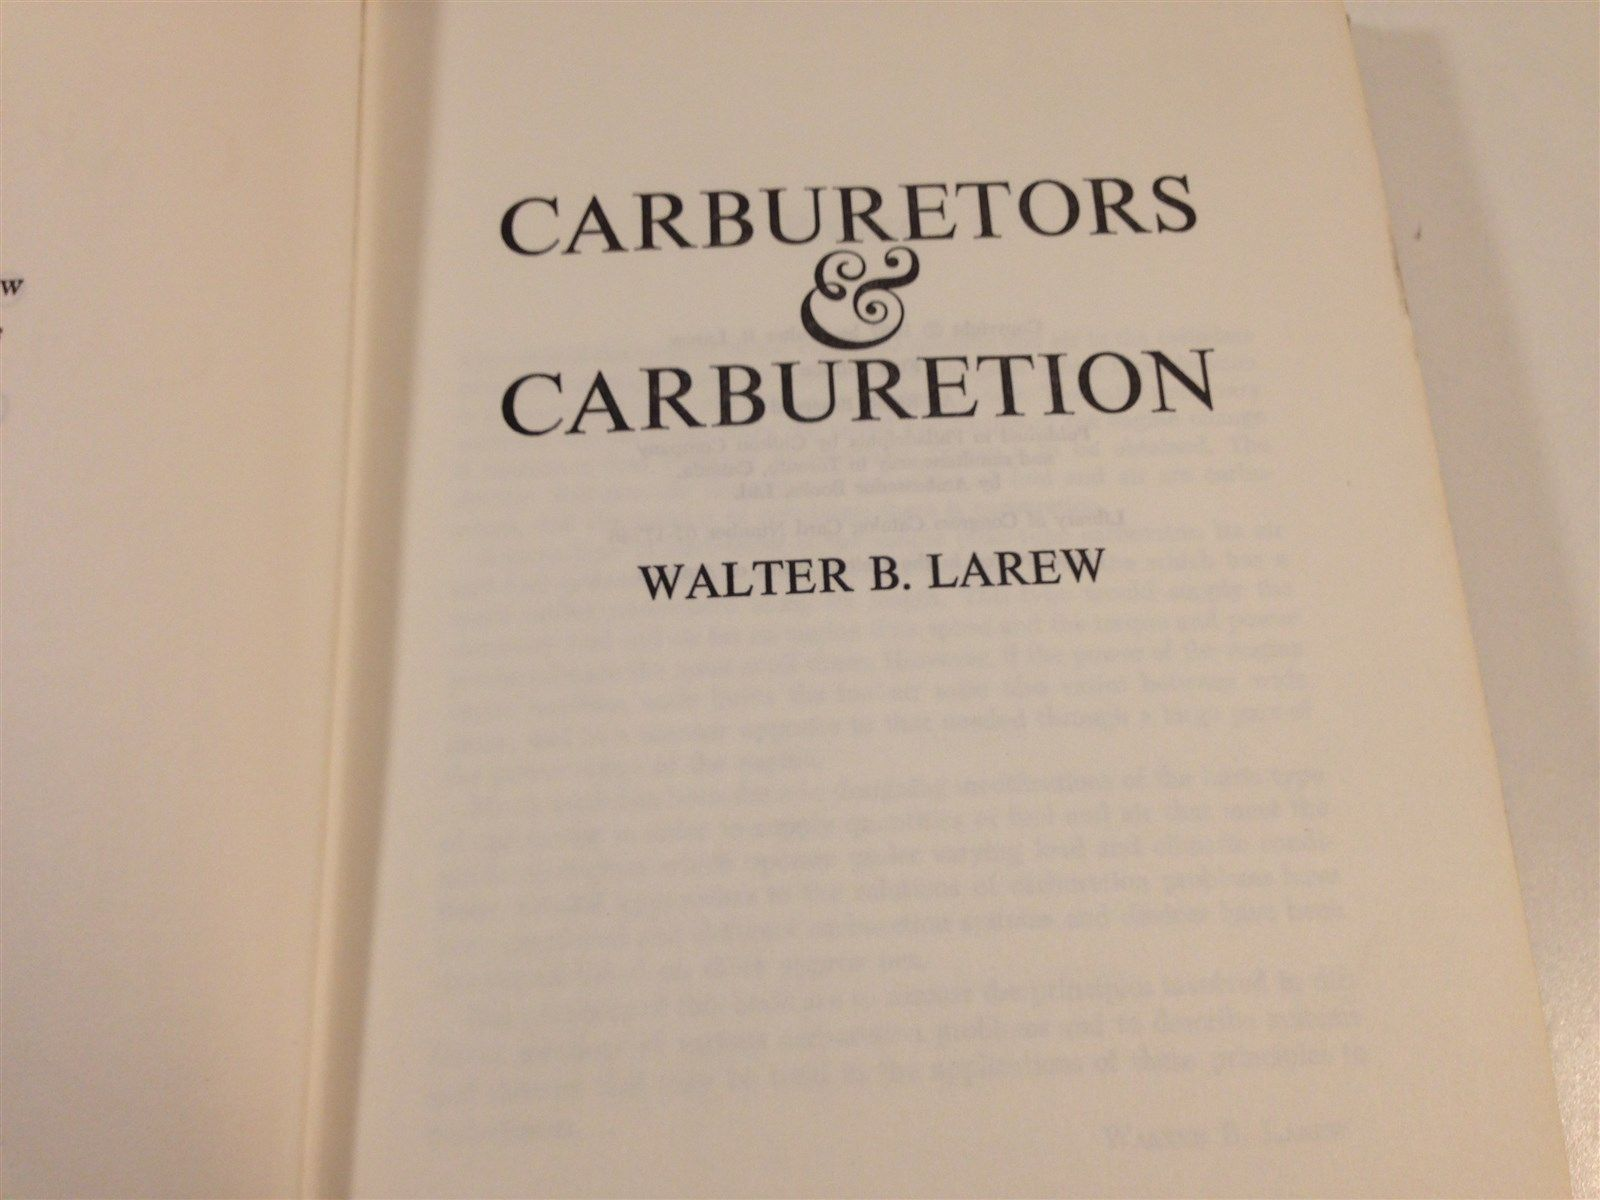 1967 Carburetors & Carburetion - Walter Larew First Edition Hardback Illustrated